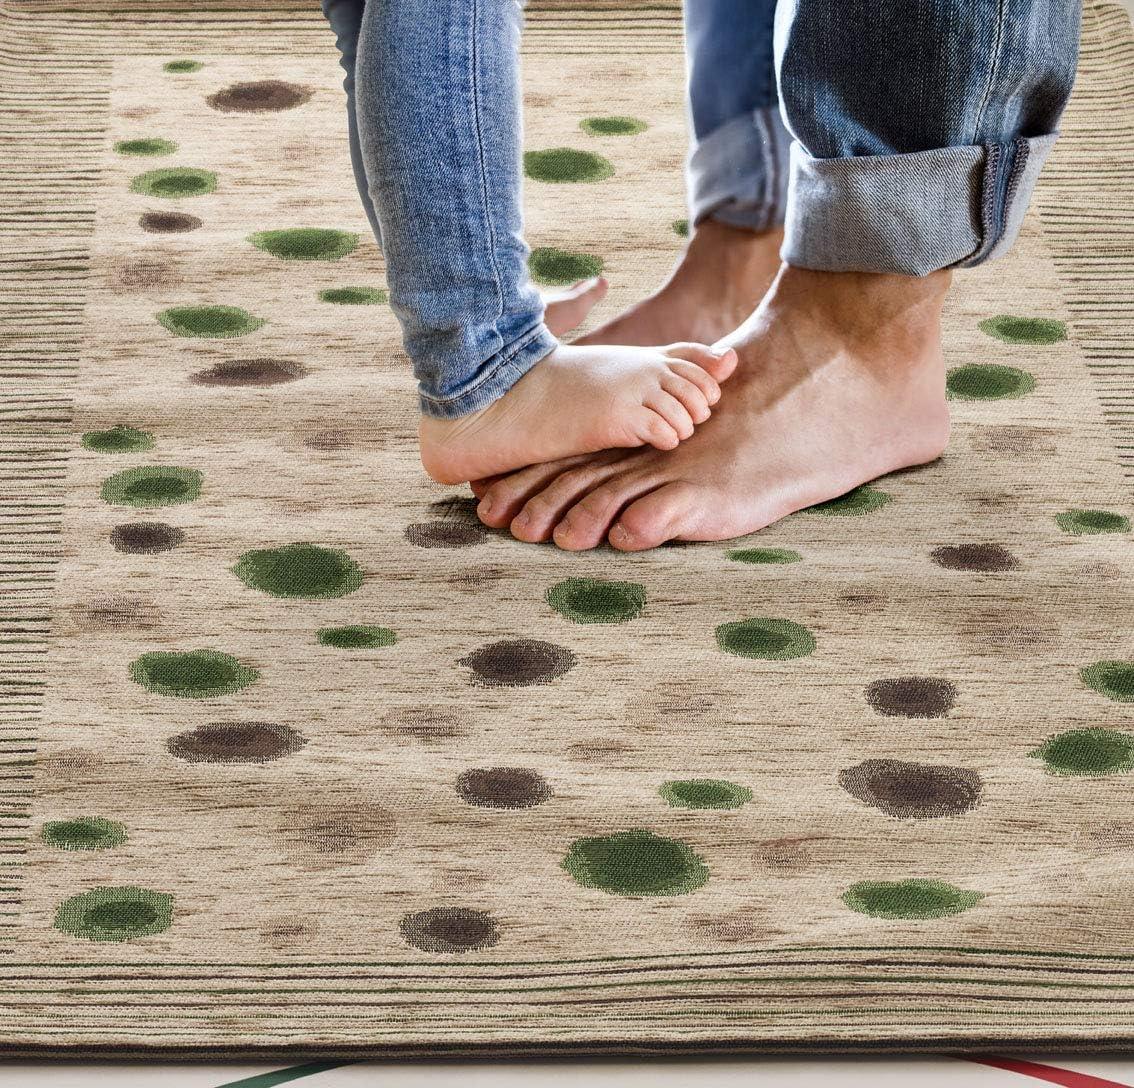 Modern Floor Mat 55x80 Spotted Carpet Made in Italy 55X80, Pistachio Green Long Runner Rug 2 Kitchen Mat Non Slip Washable Non Slip Mat for Kitchen Homelife Kitchen Rug